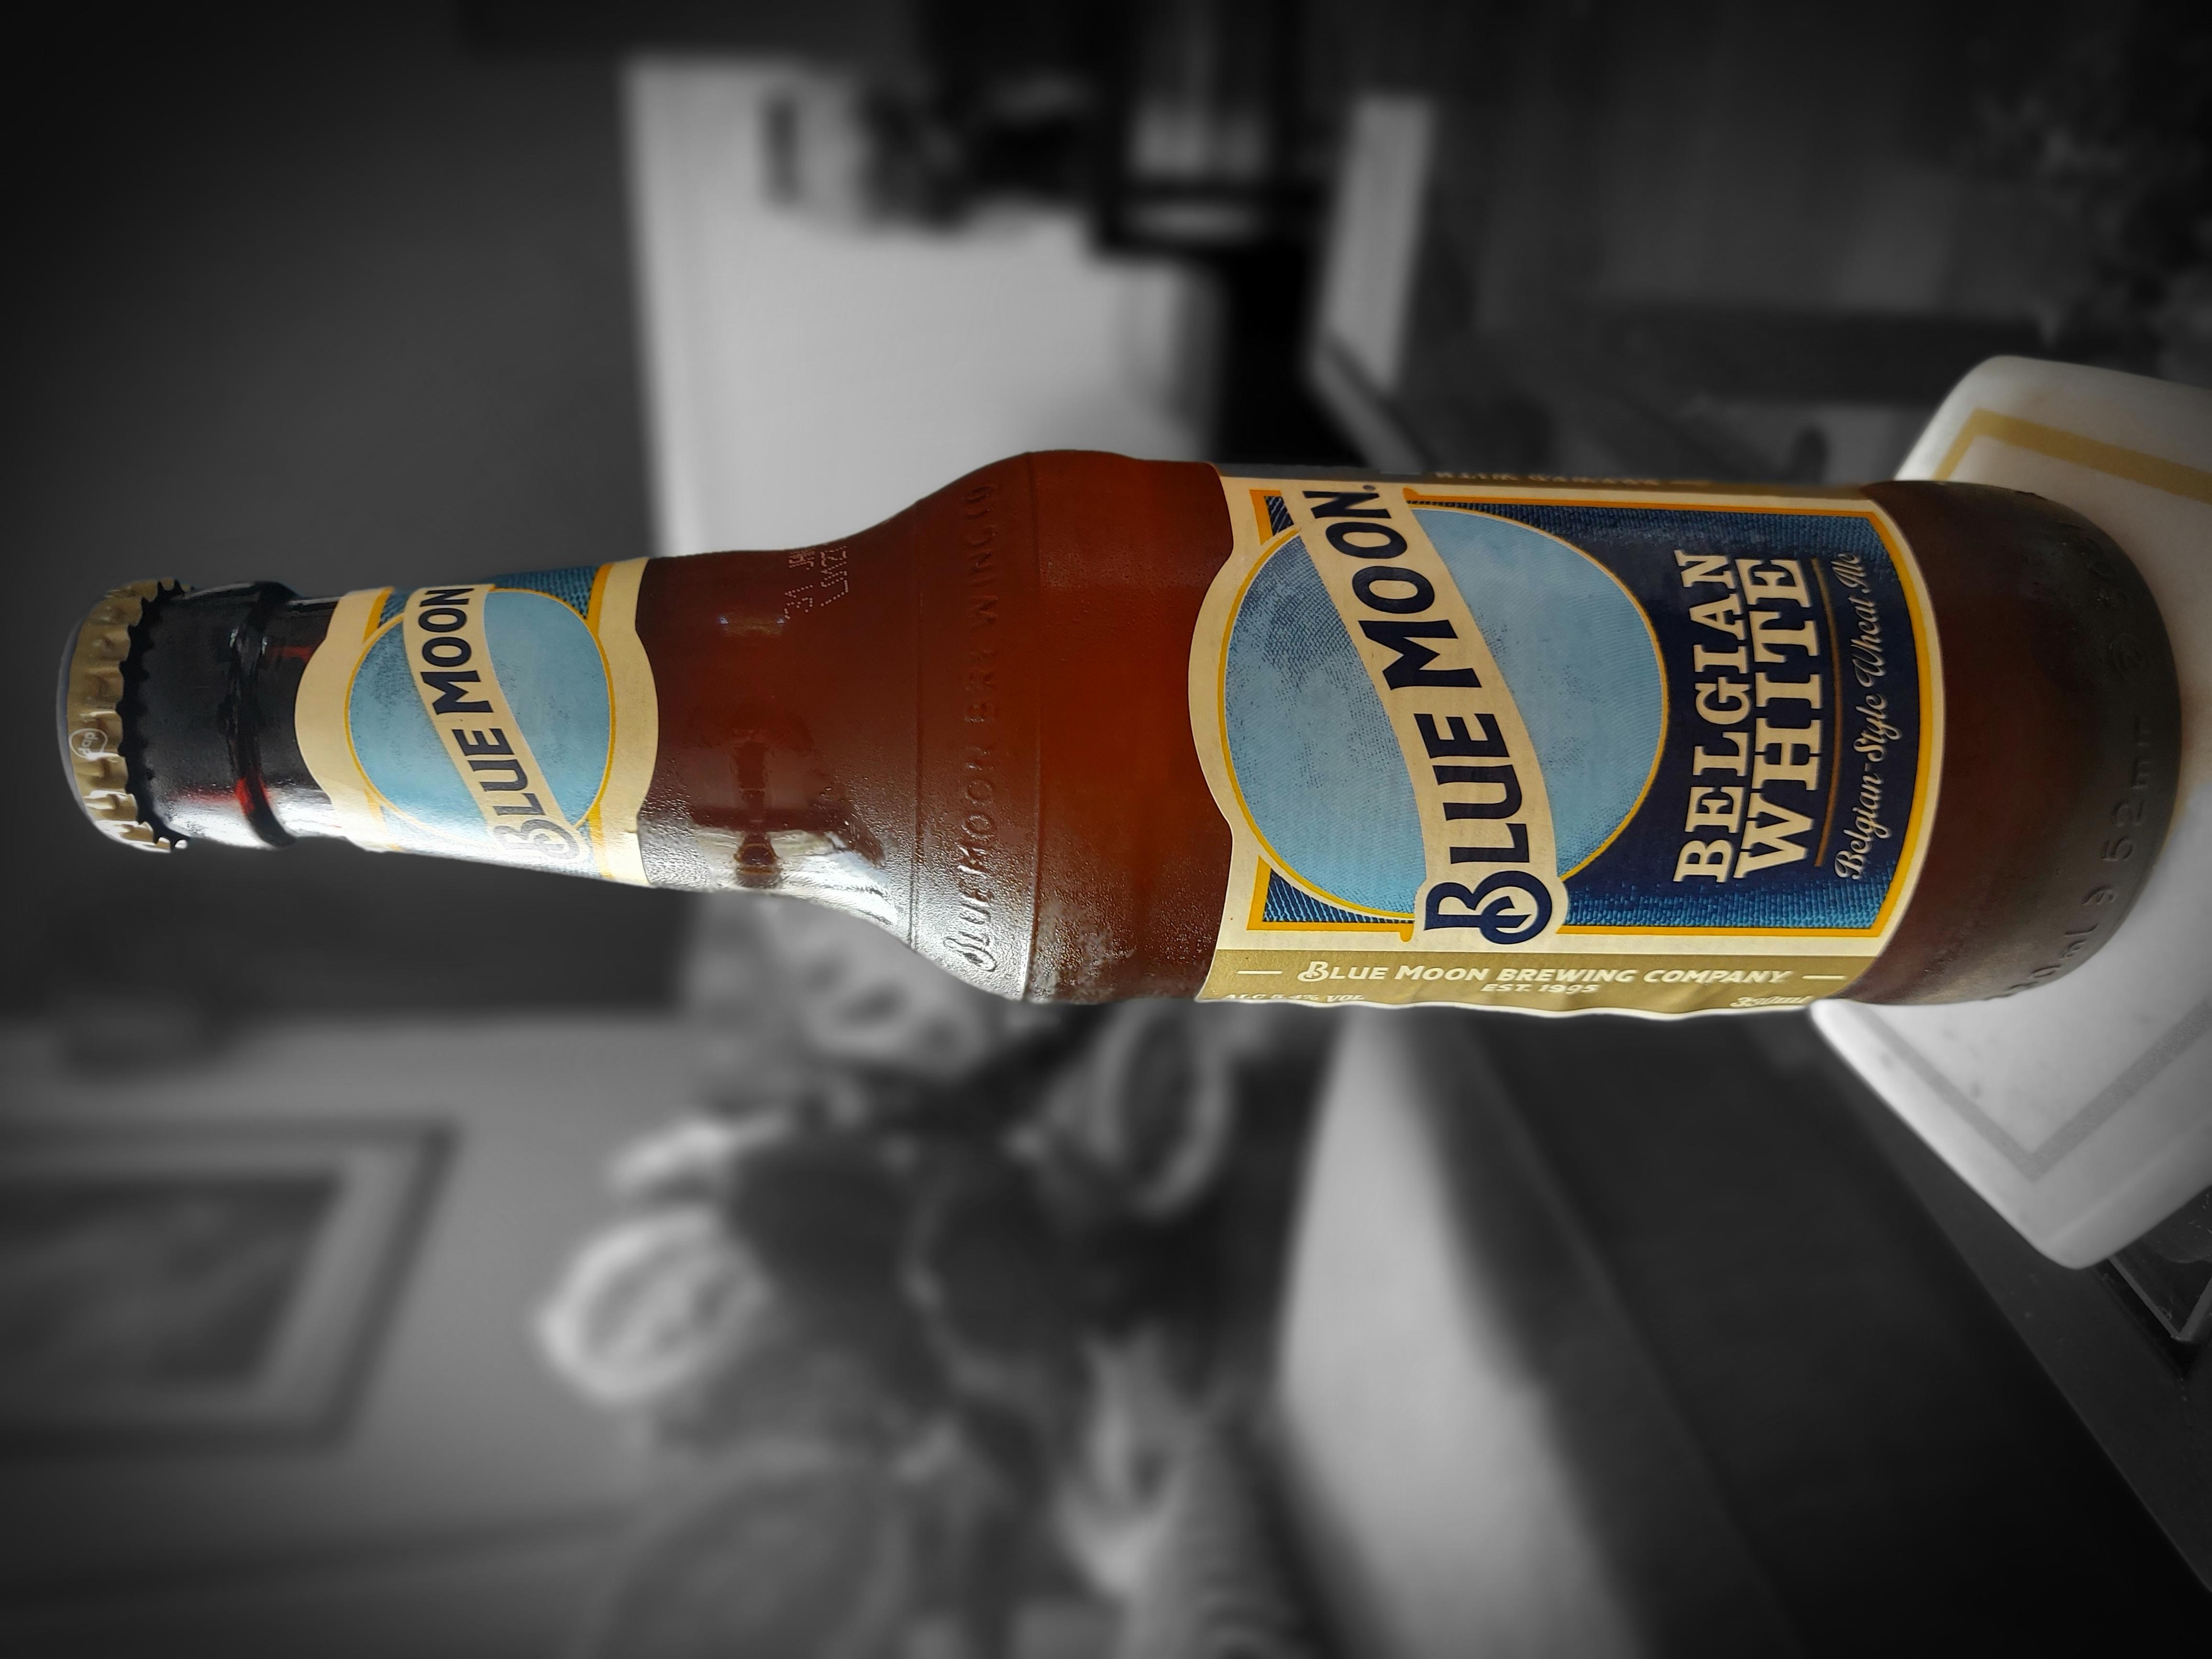 Blue Moon Wheat Beer